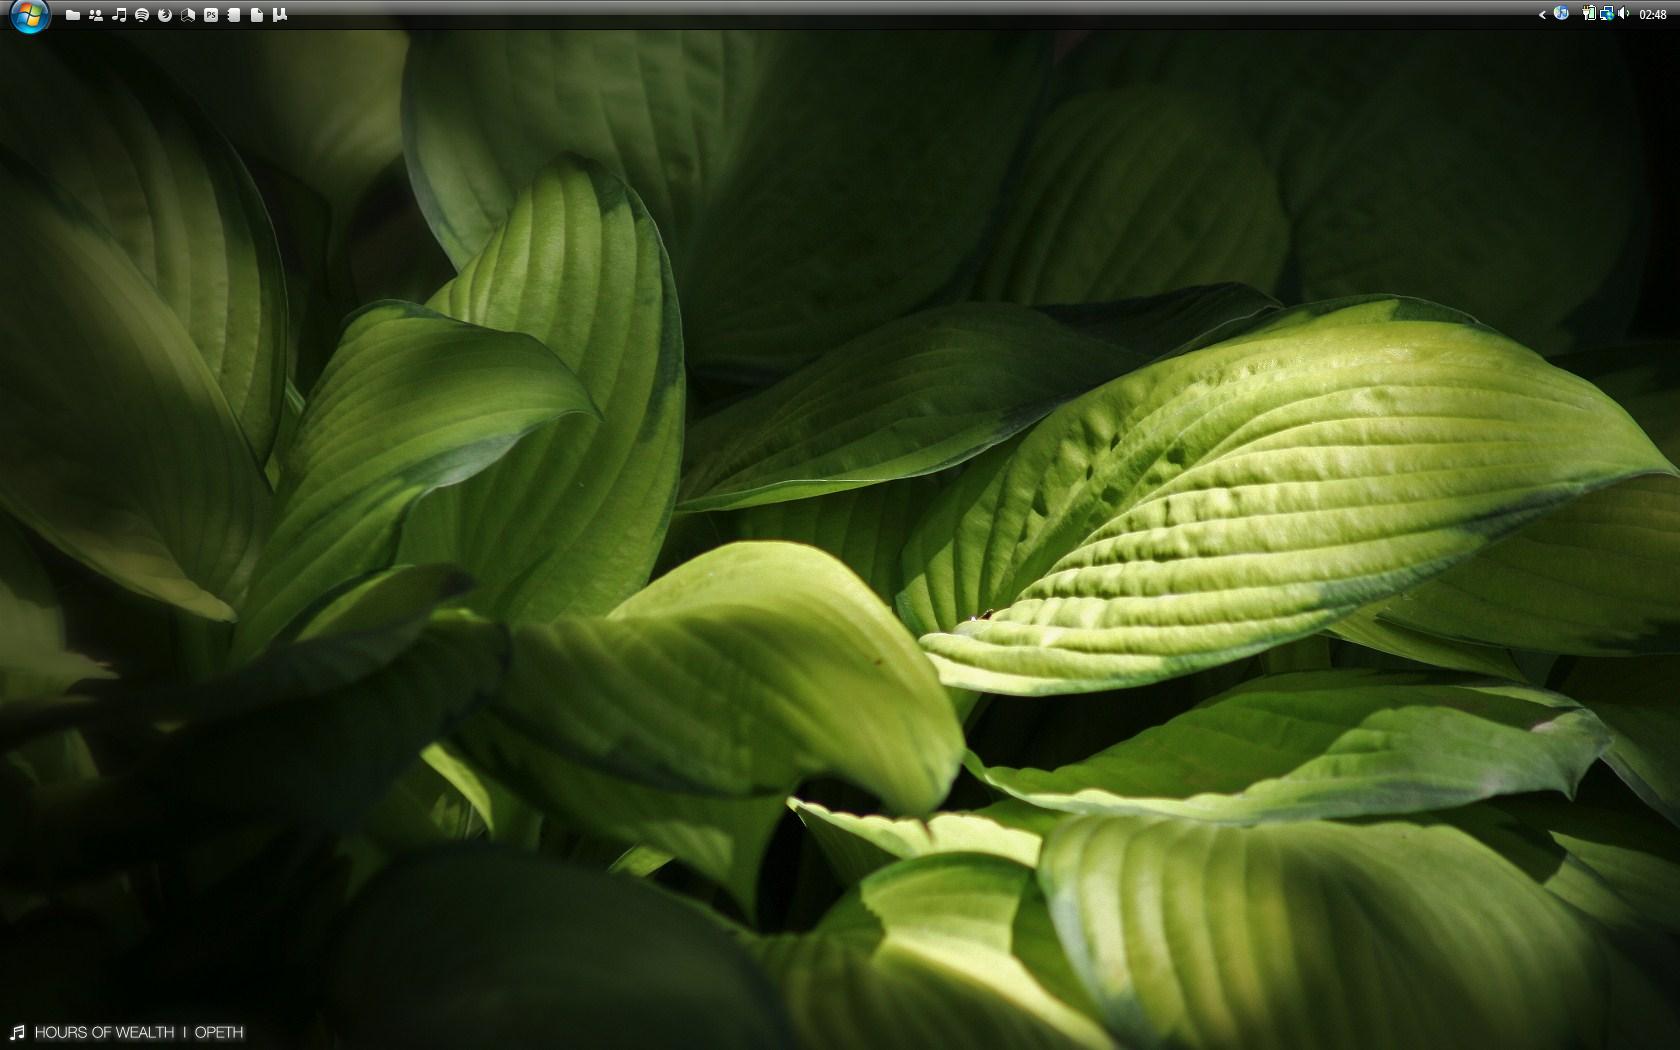 Desktop March '10 by chanq